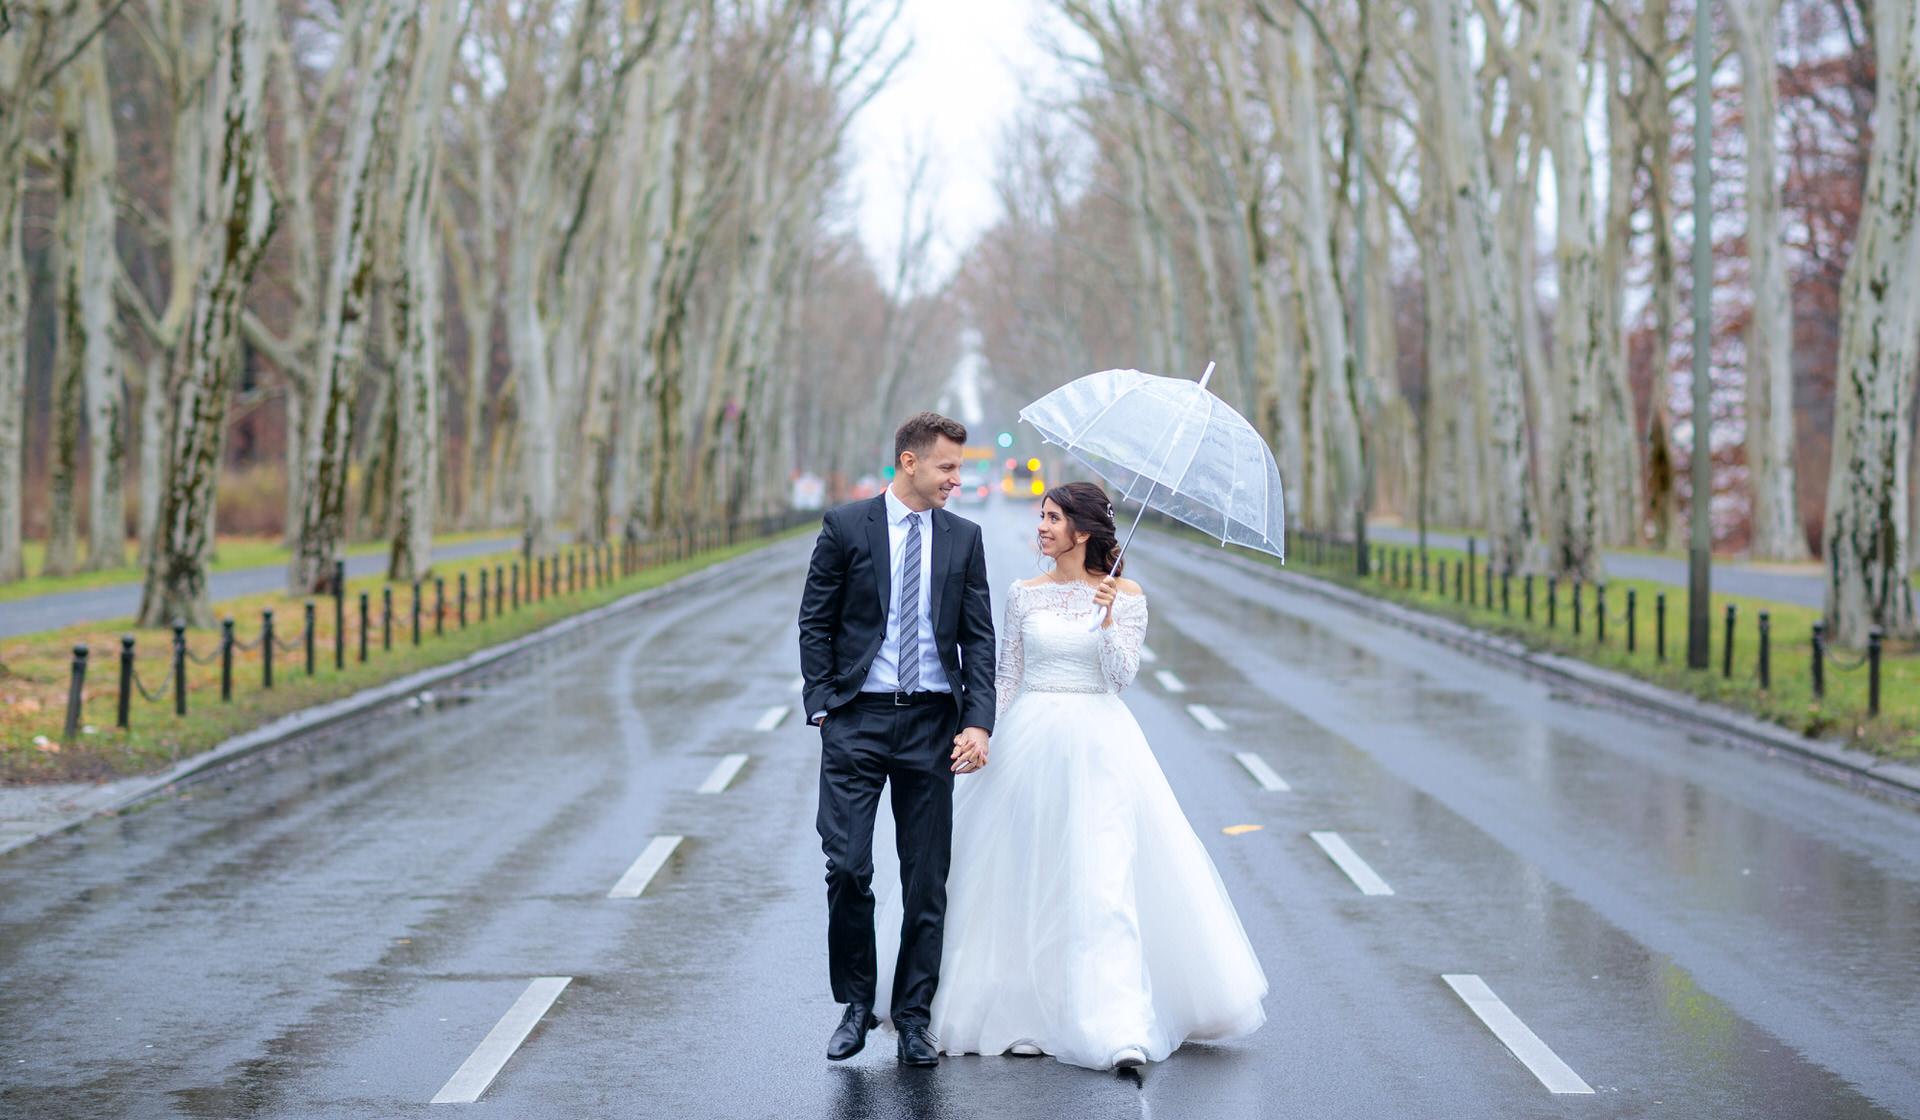 Brautpaar spaziert mit Regenschirm in Berlin